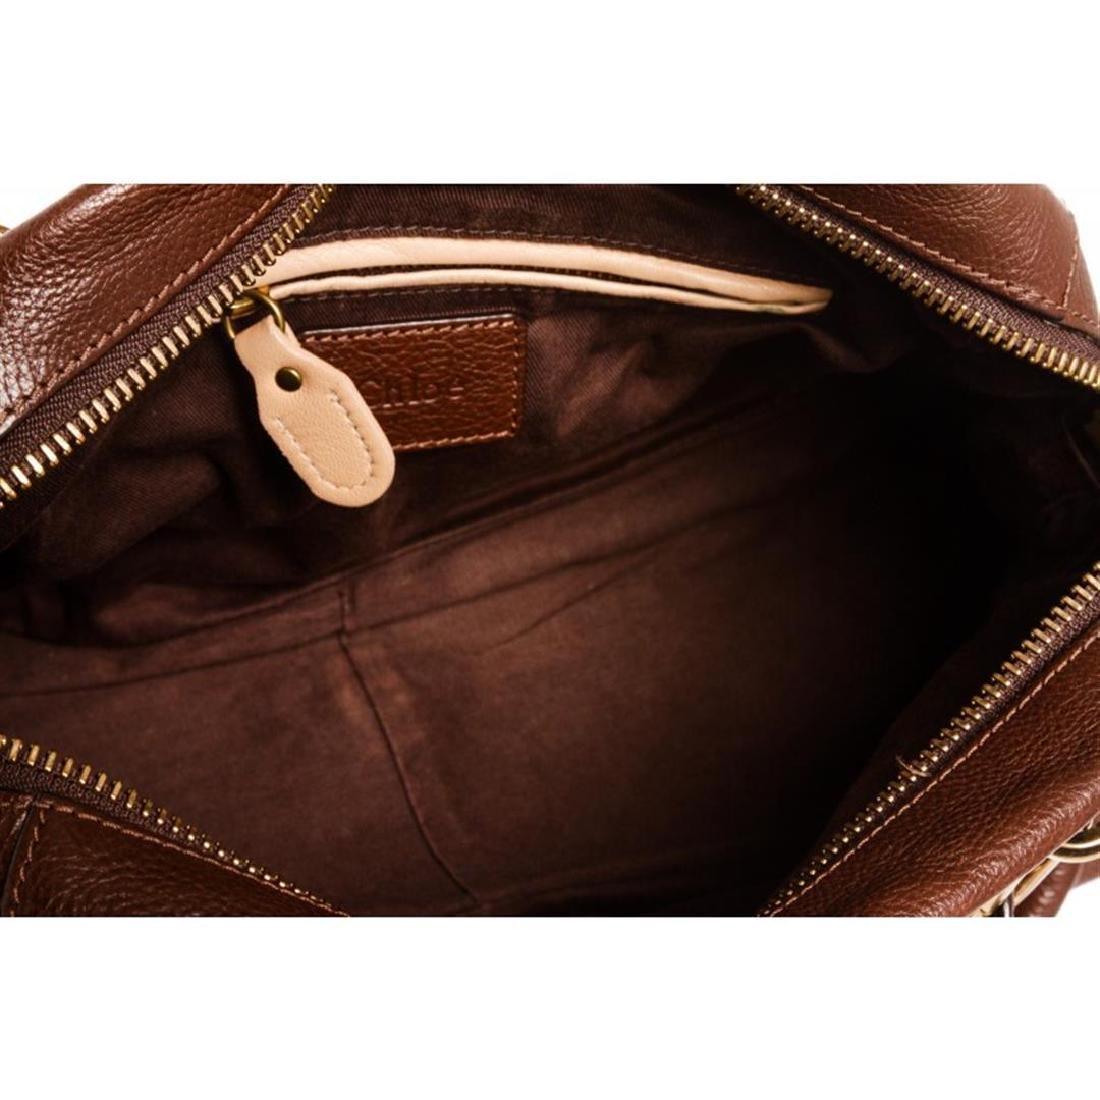 Chloe Brown Leather Paraty Medium Satchel Handbag - 5